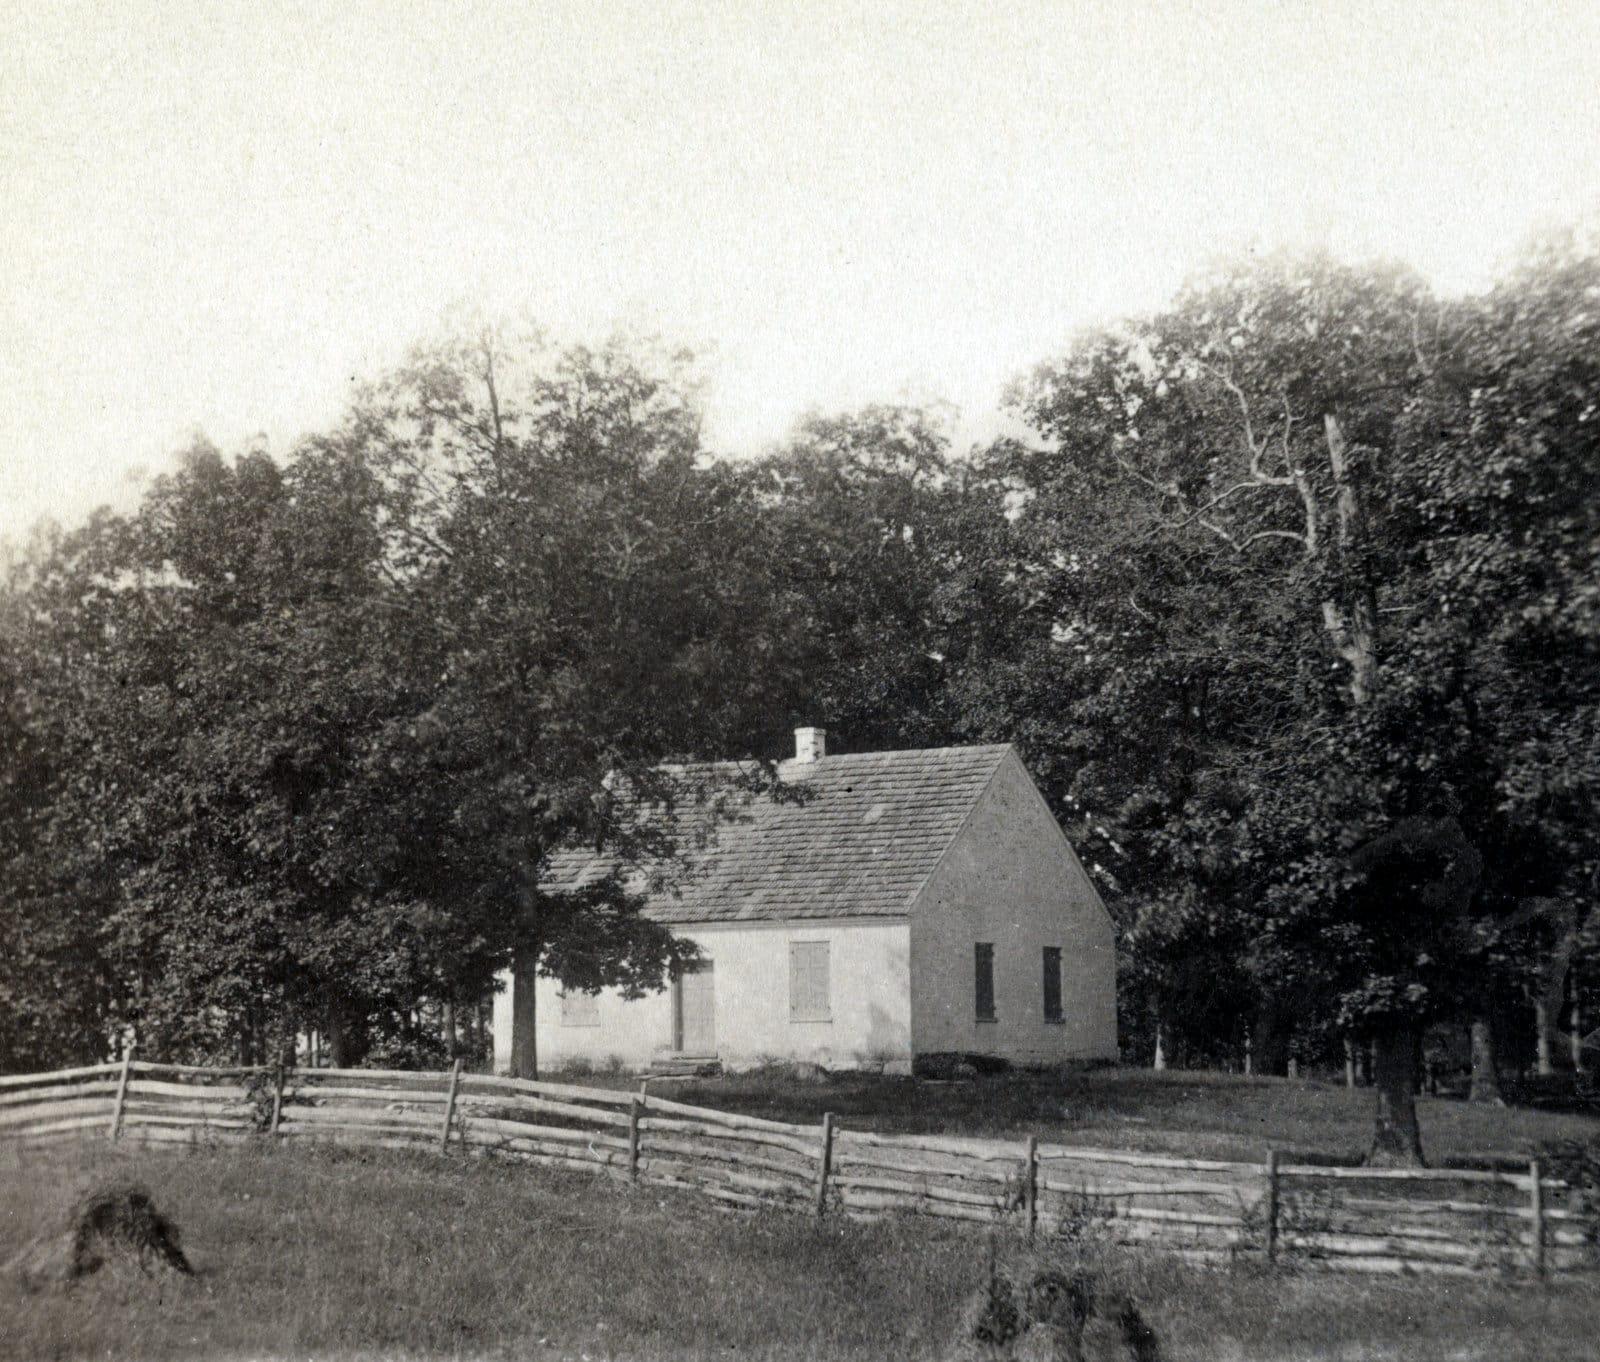 Dunker Church - Antietam, Maryland (1862)